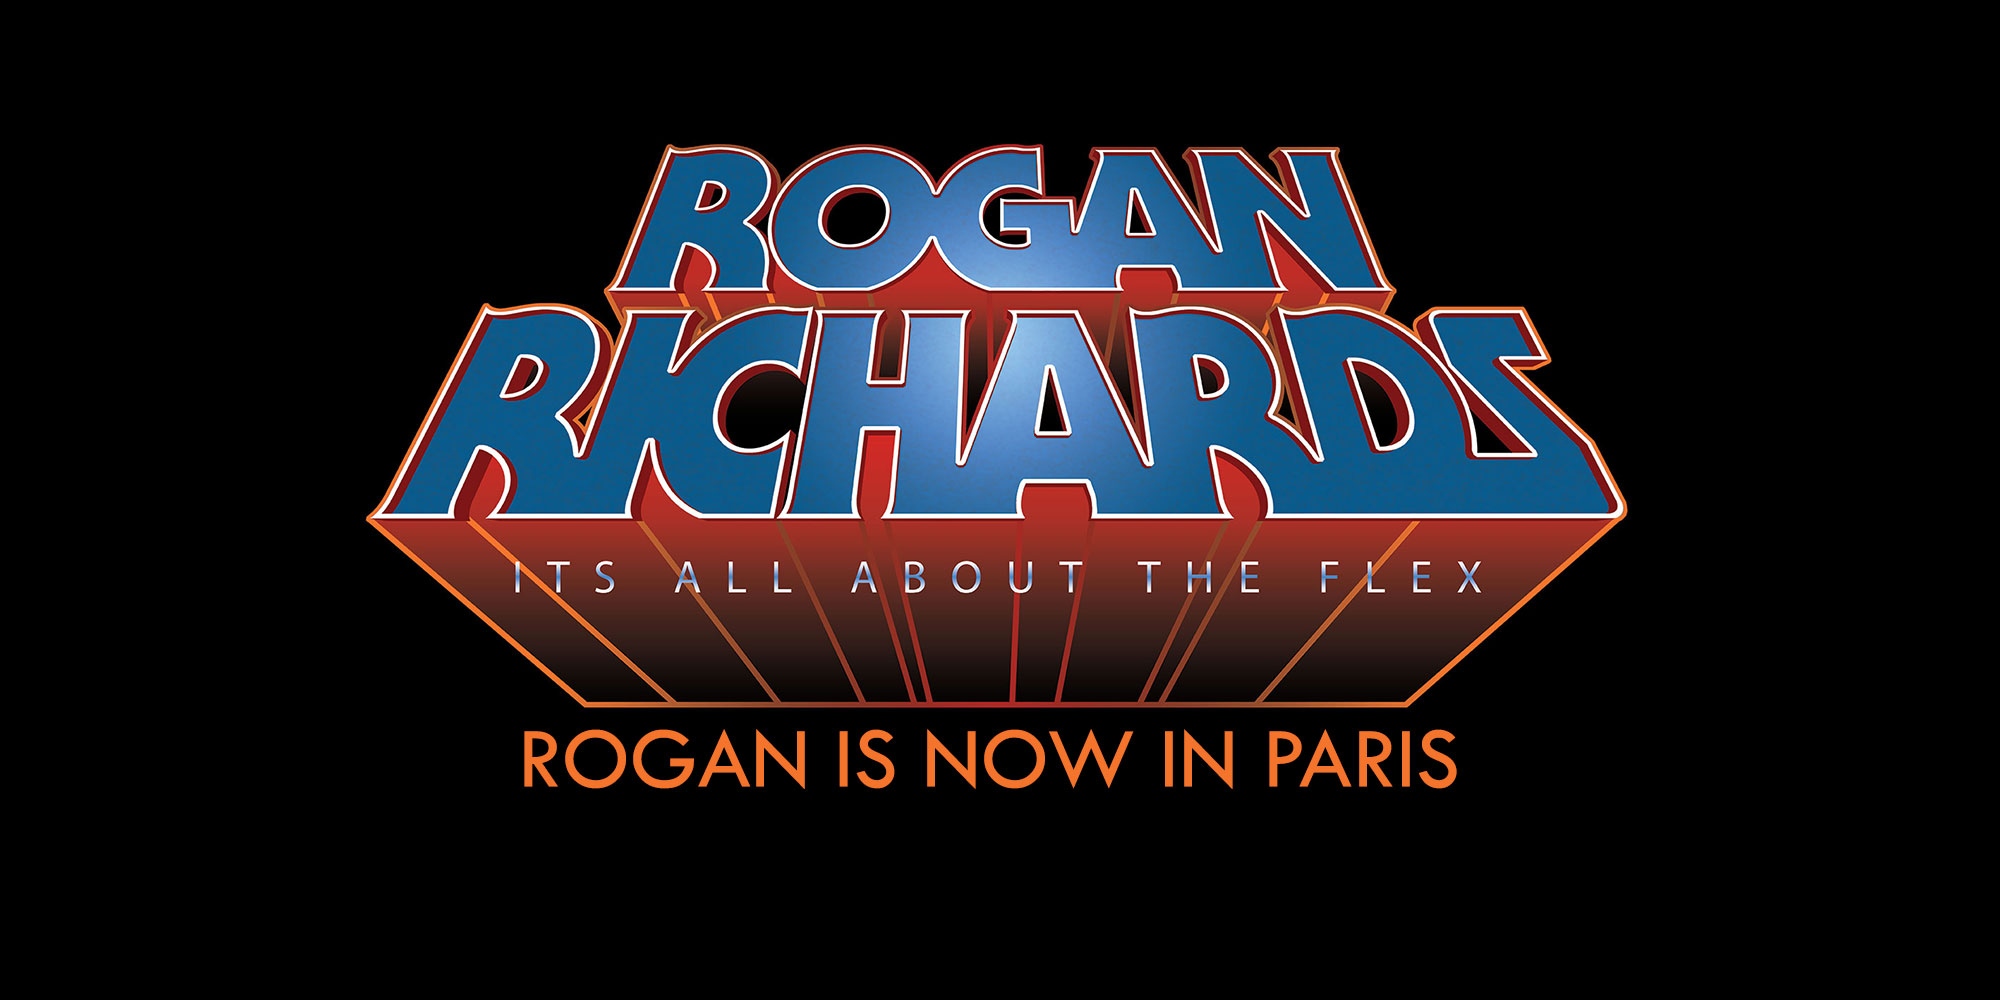 ROGAN is in PARIS